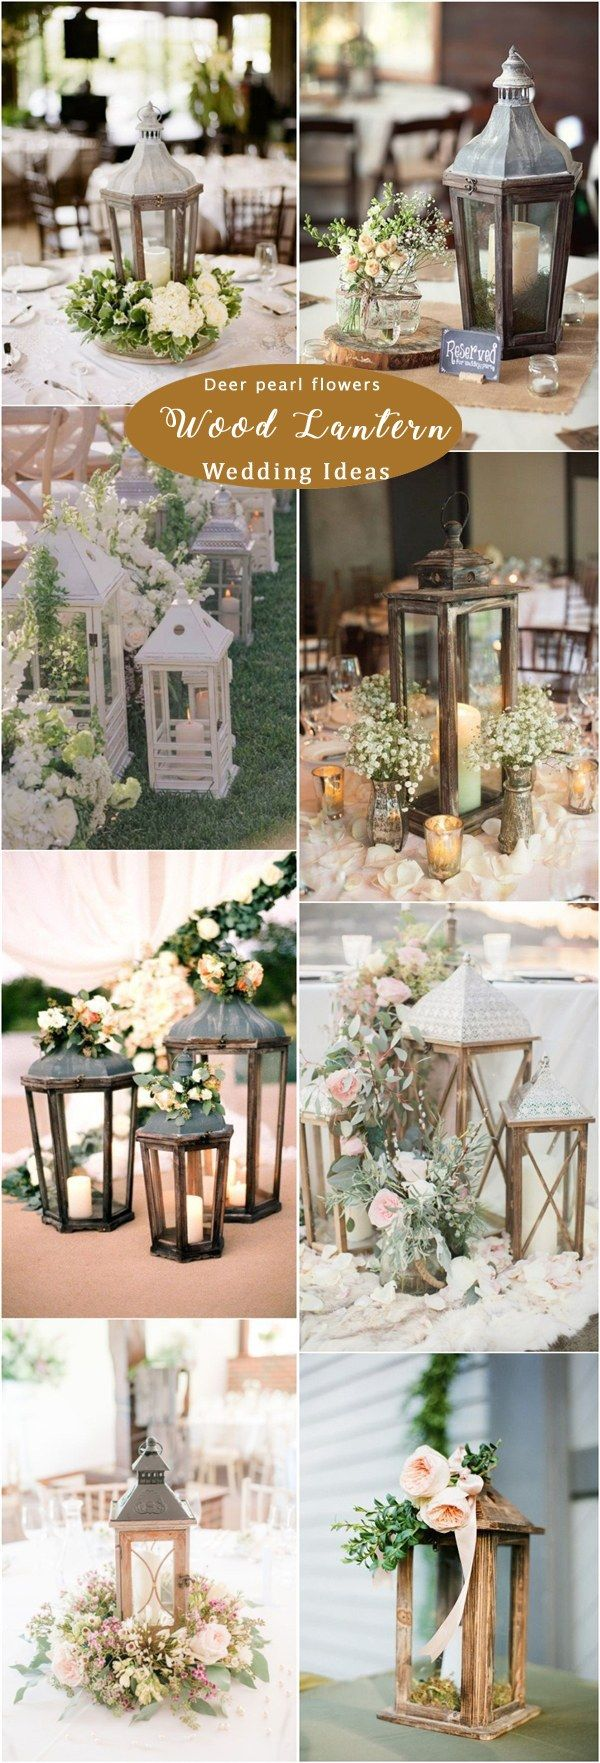 White wedding decoration ideas   Rustic Woodsy Wedding Decor Ideas for   Woodsy wedding